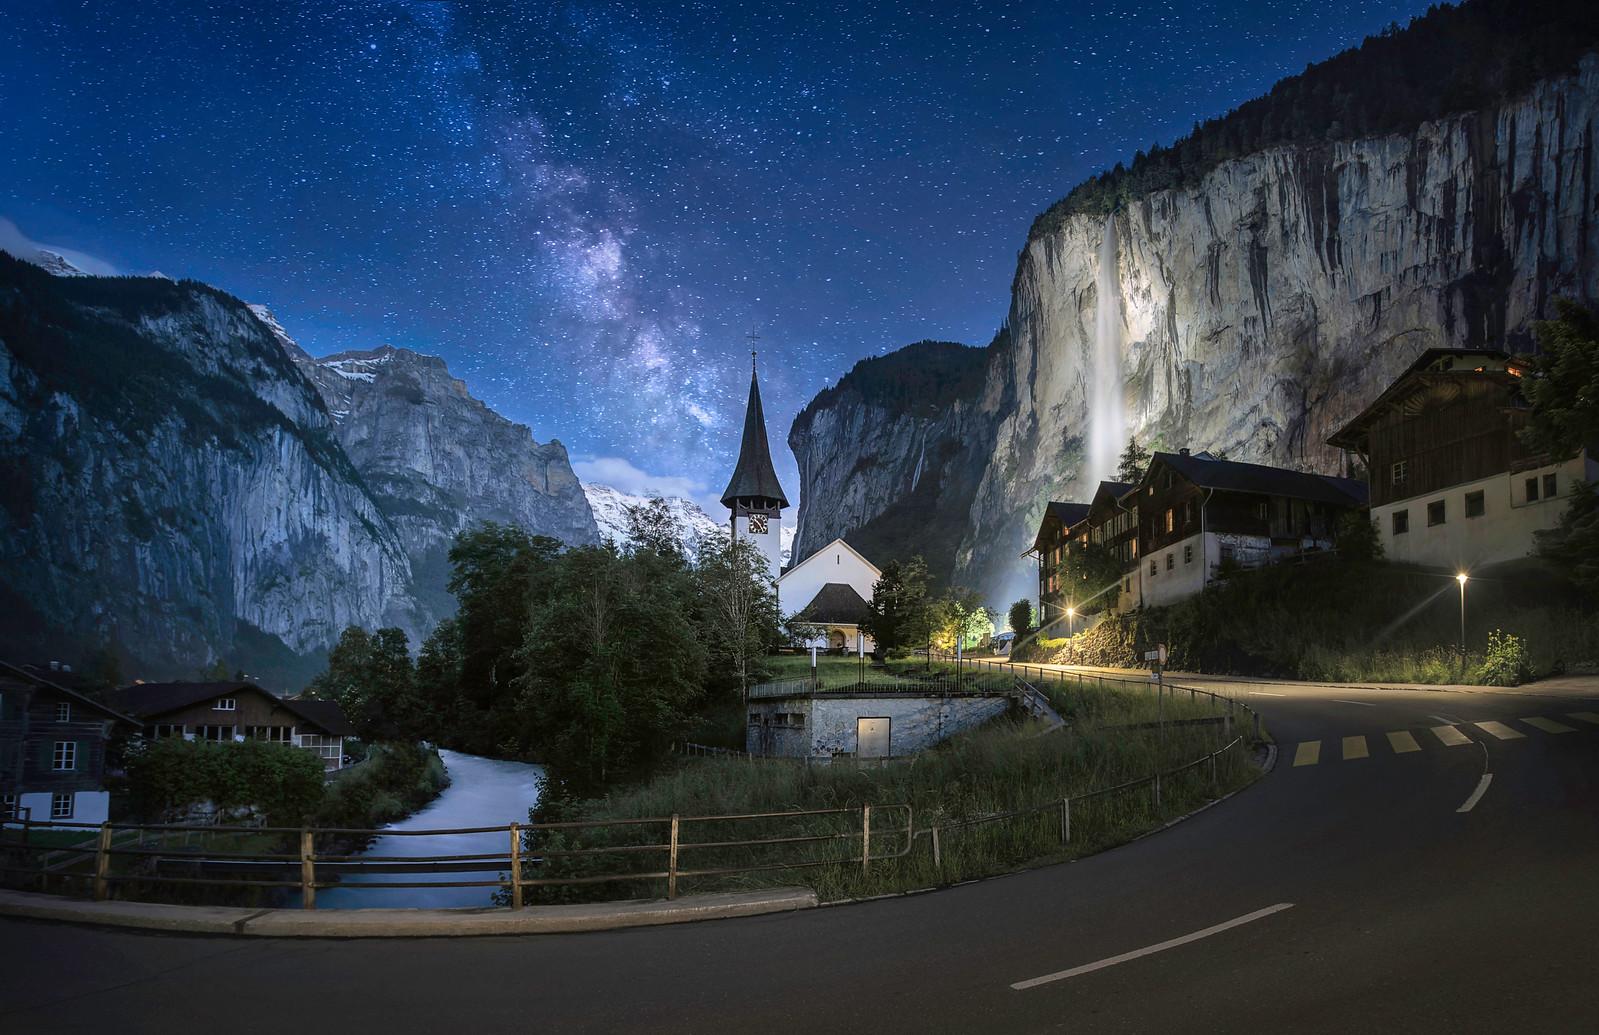 Starry Night in Switzerland